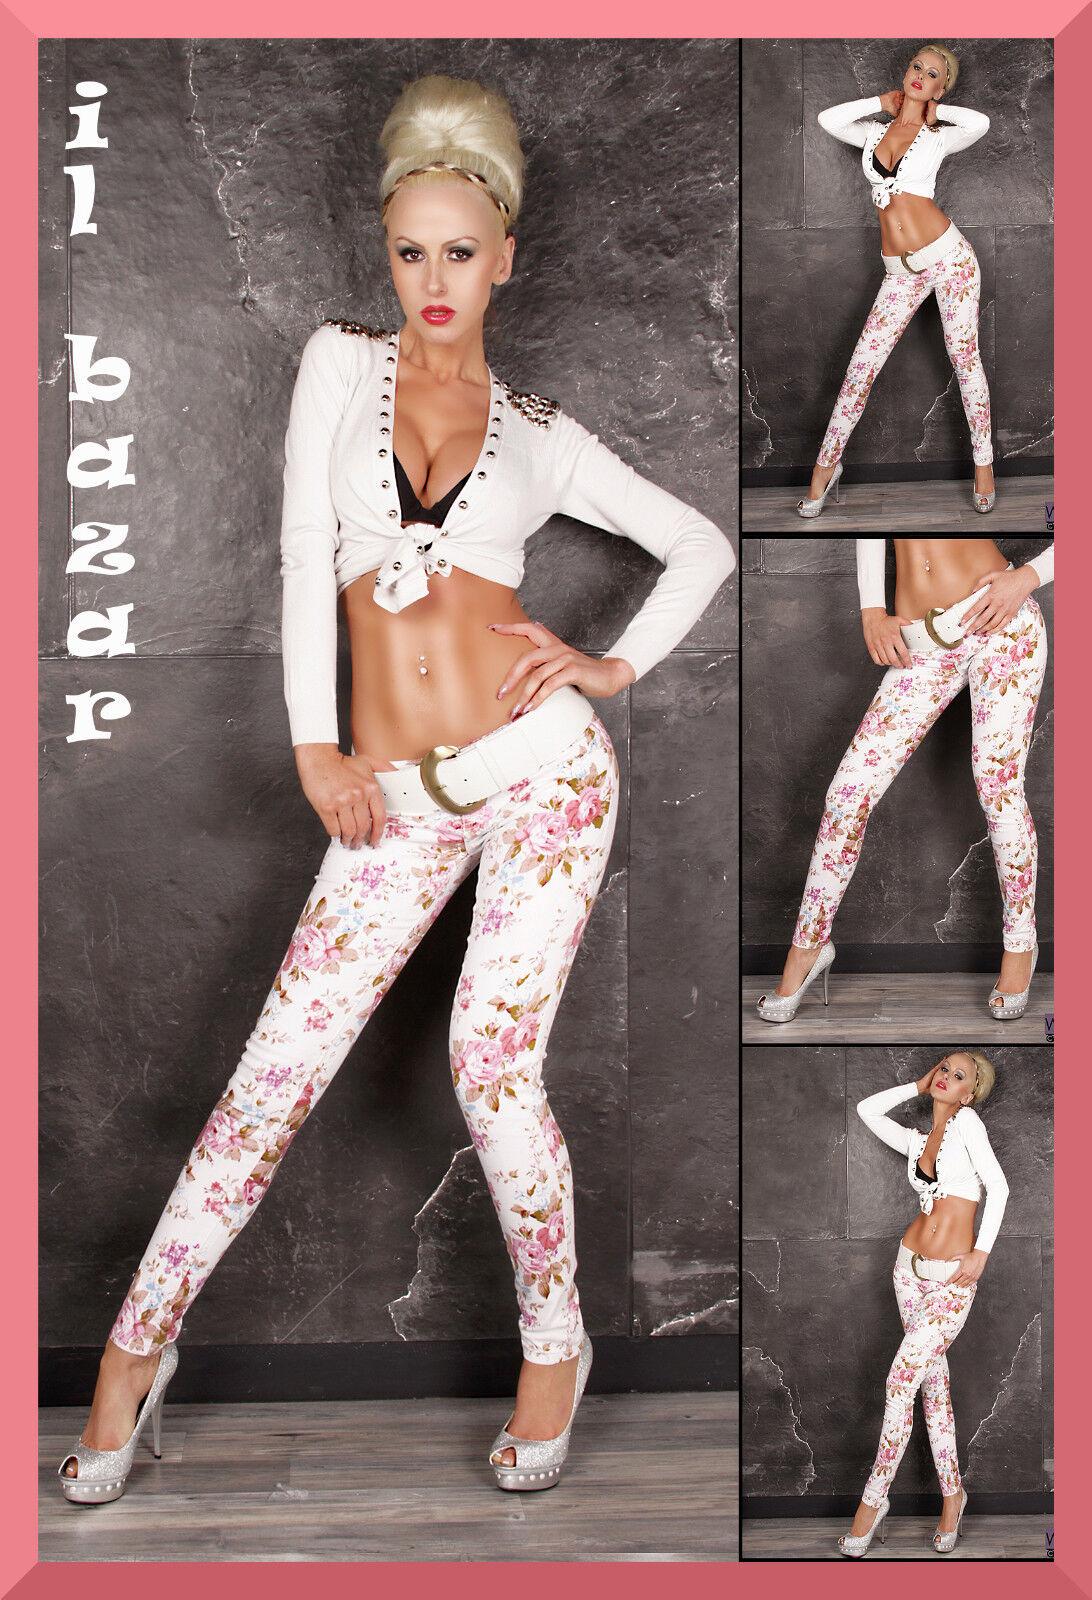 Pantalone jeans bianco stampa floreale denim di cotone taglie  40; 42; 44; 46